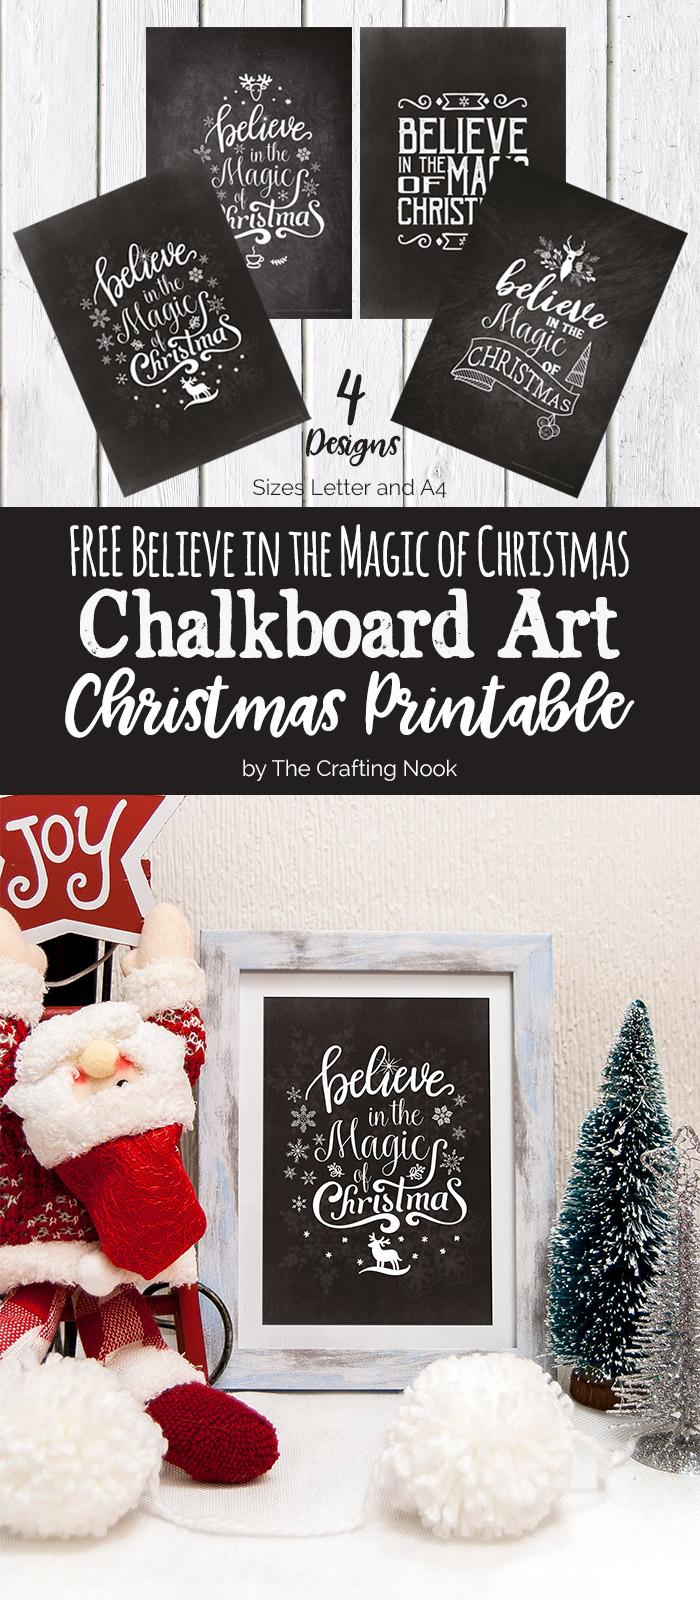 FREE Chalkboard Art Christmas Printables